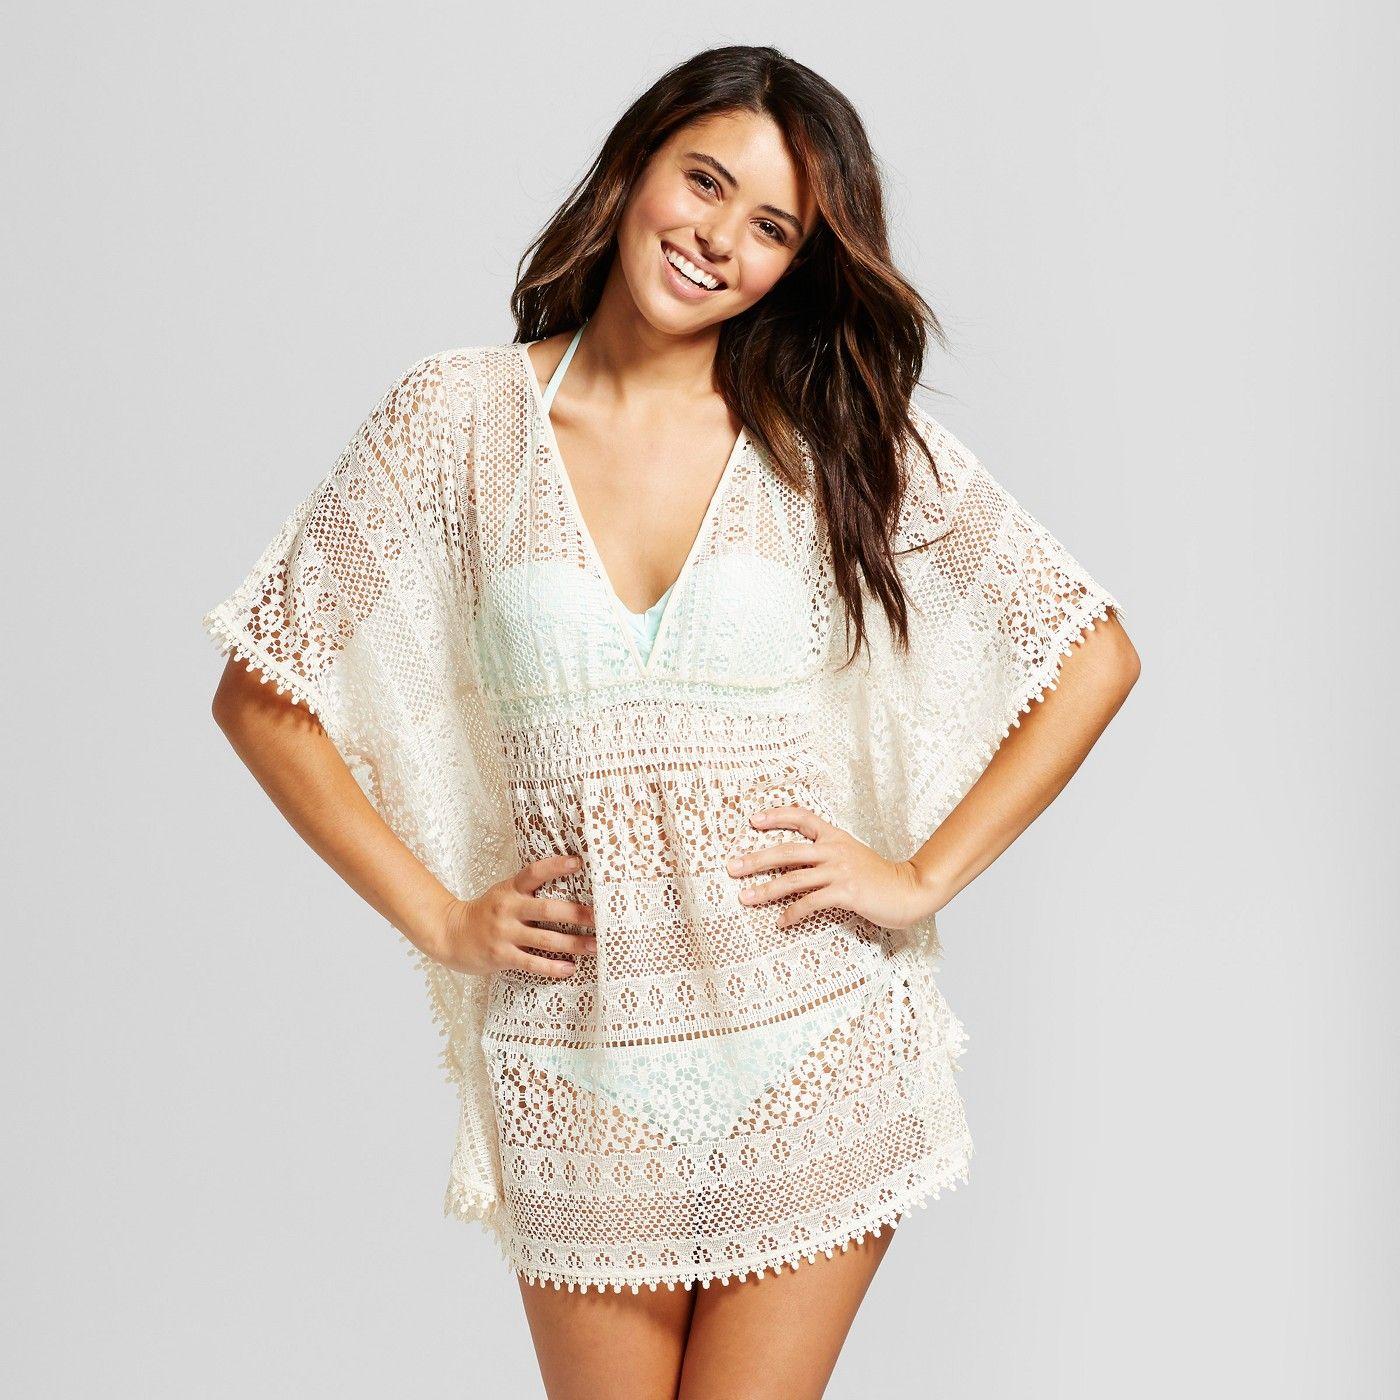 9c20064cd0a16 Women's Crochet Lace Kaftan Cover Up - Xhilaration? Black XL #Lace,  #Kaftan, #Women